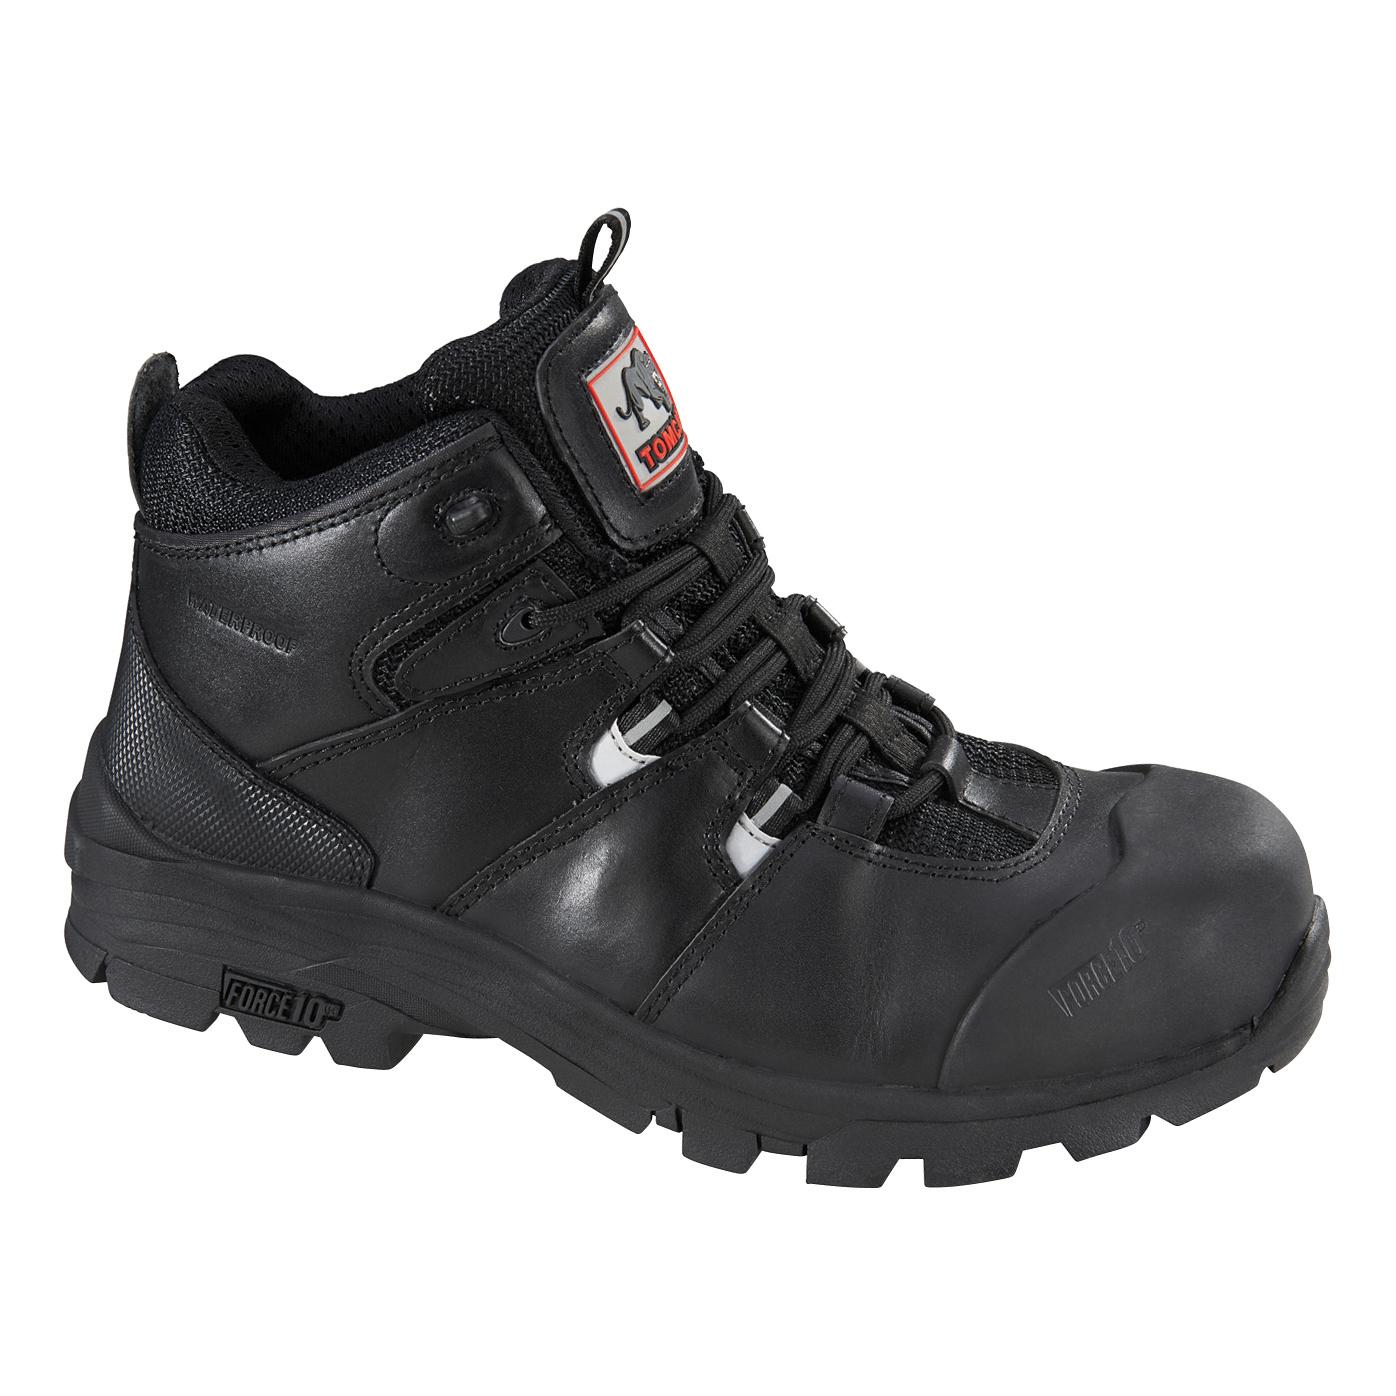 Rockfall Peakmoor Hiker 100% Non-Metallic Fibreglass Toecap Size 9 Blk Ref TC4200-9 *5-7 Day Leadtime*